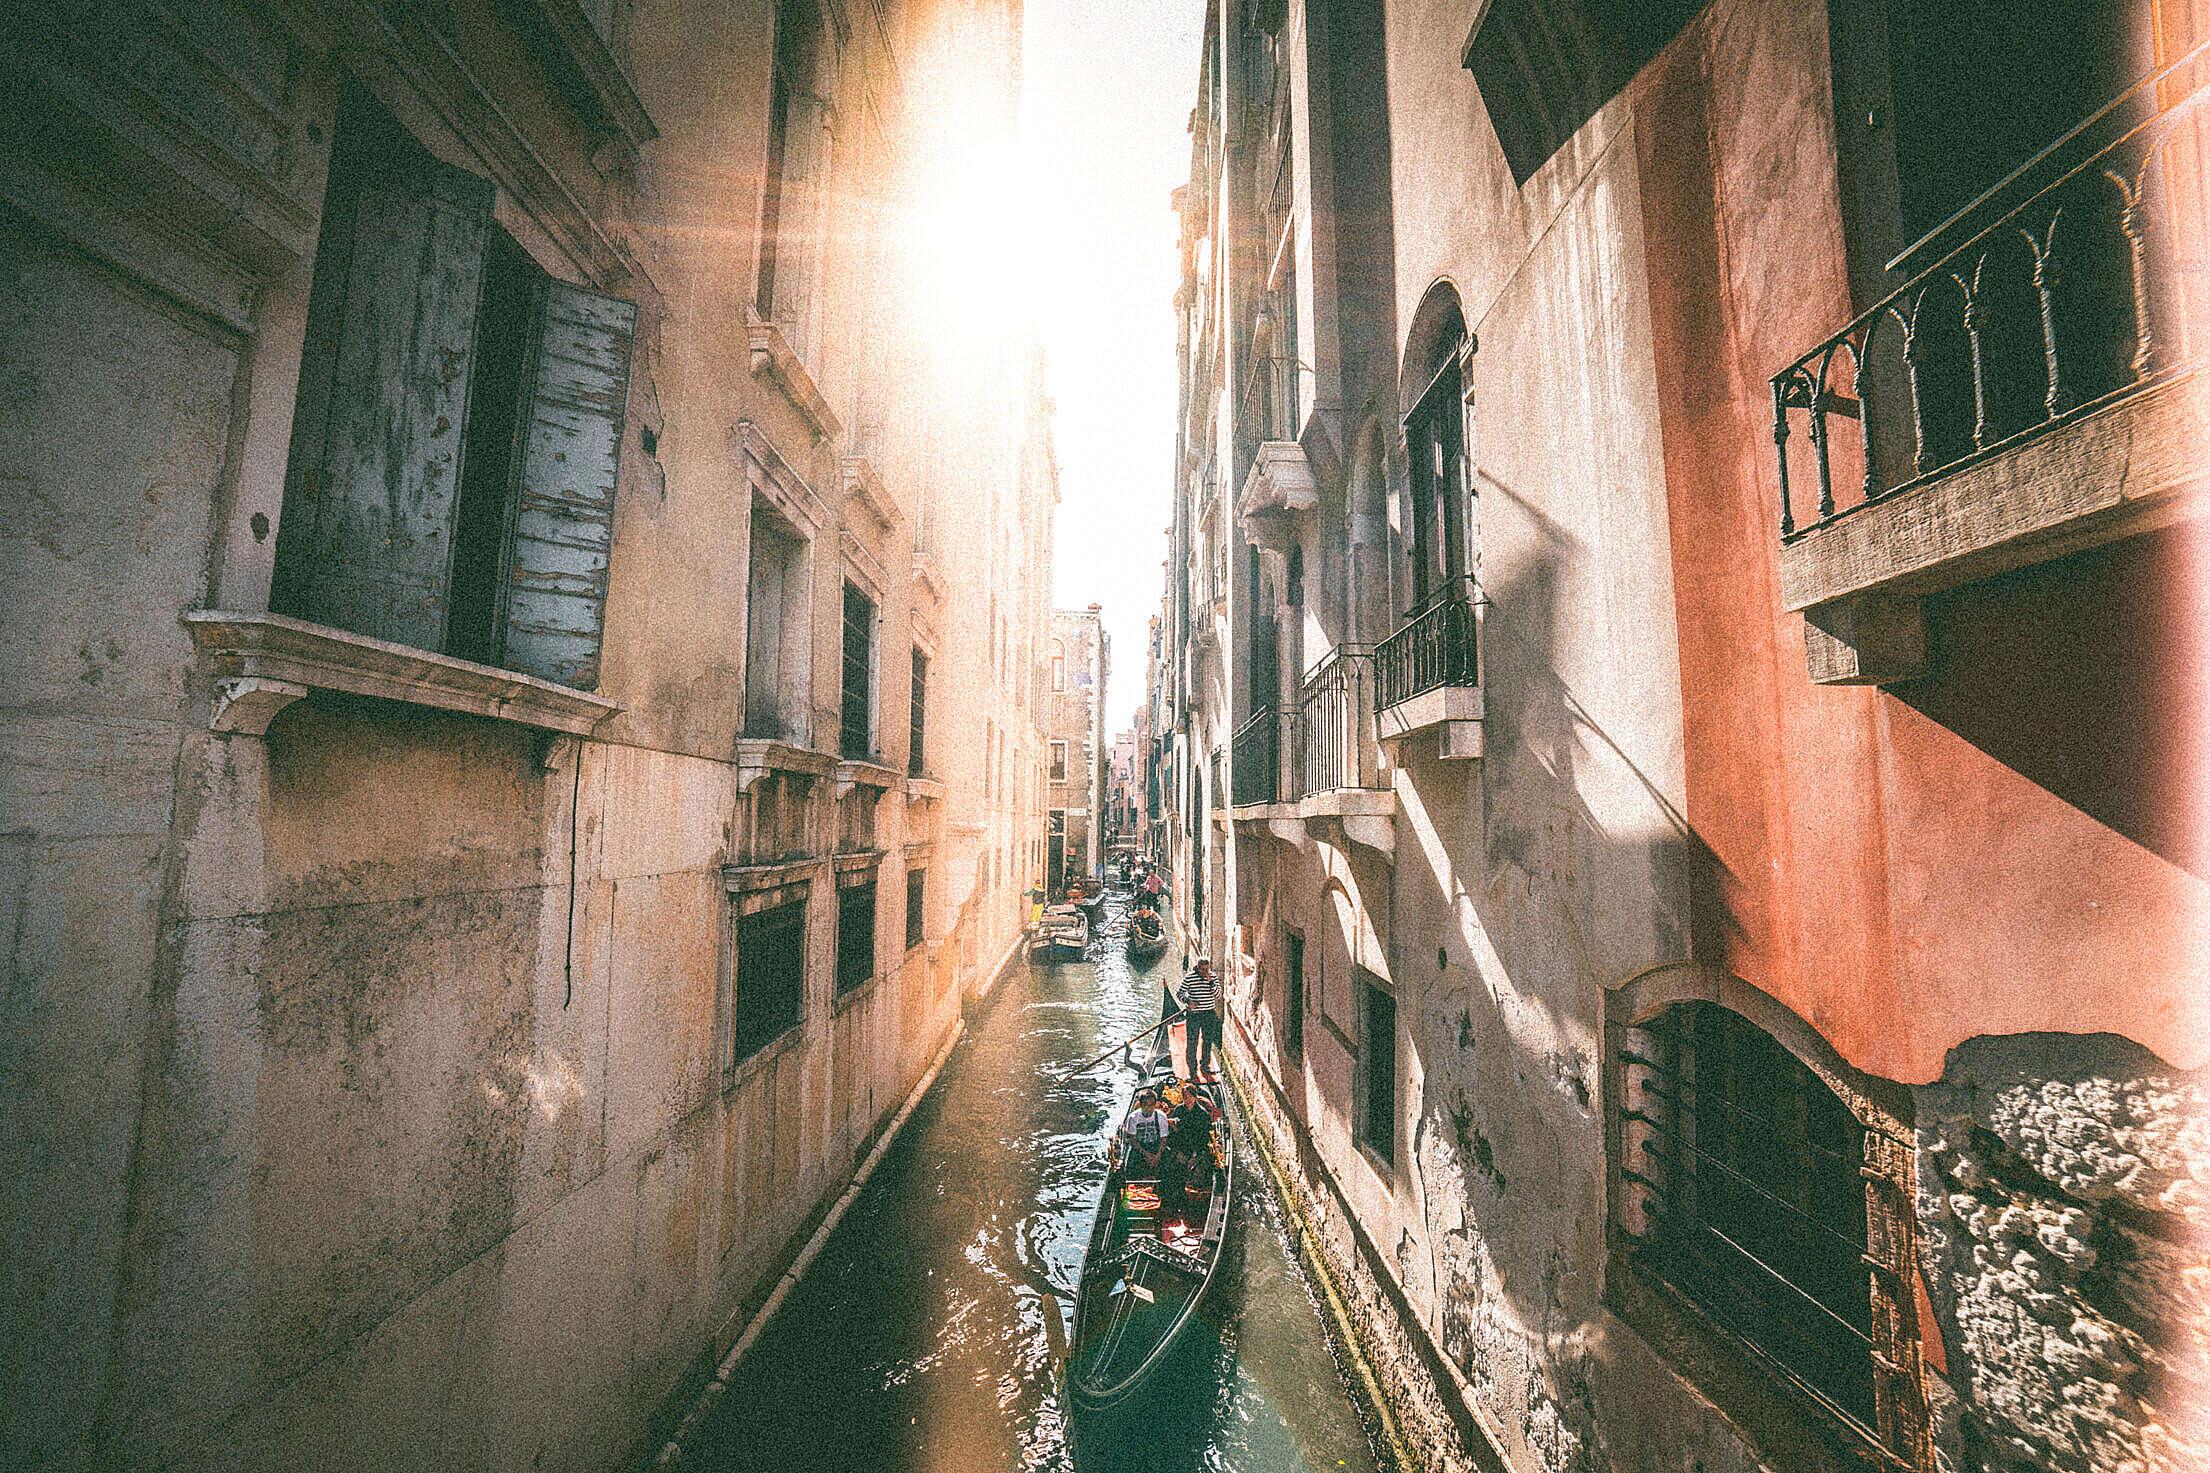 Venice Canals with Gondolas Free Stock Photo